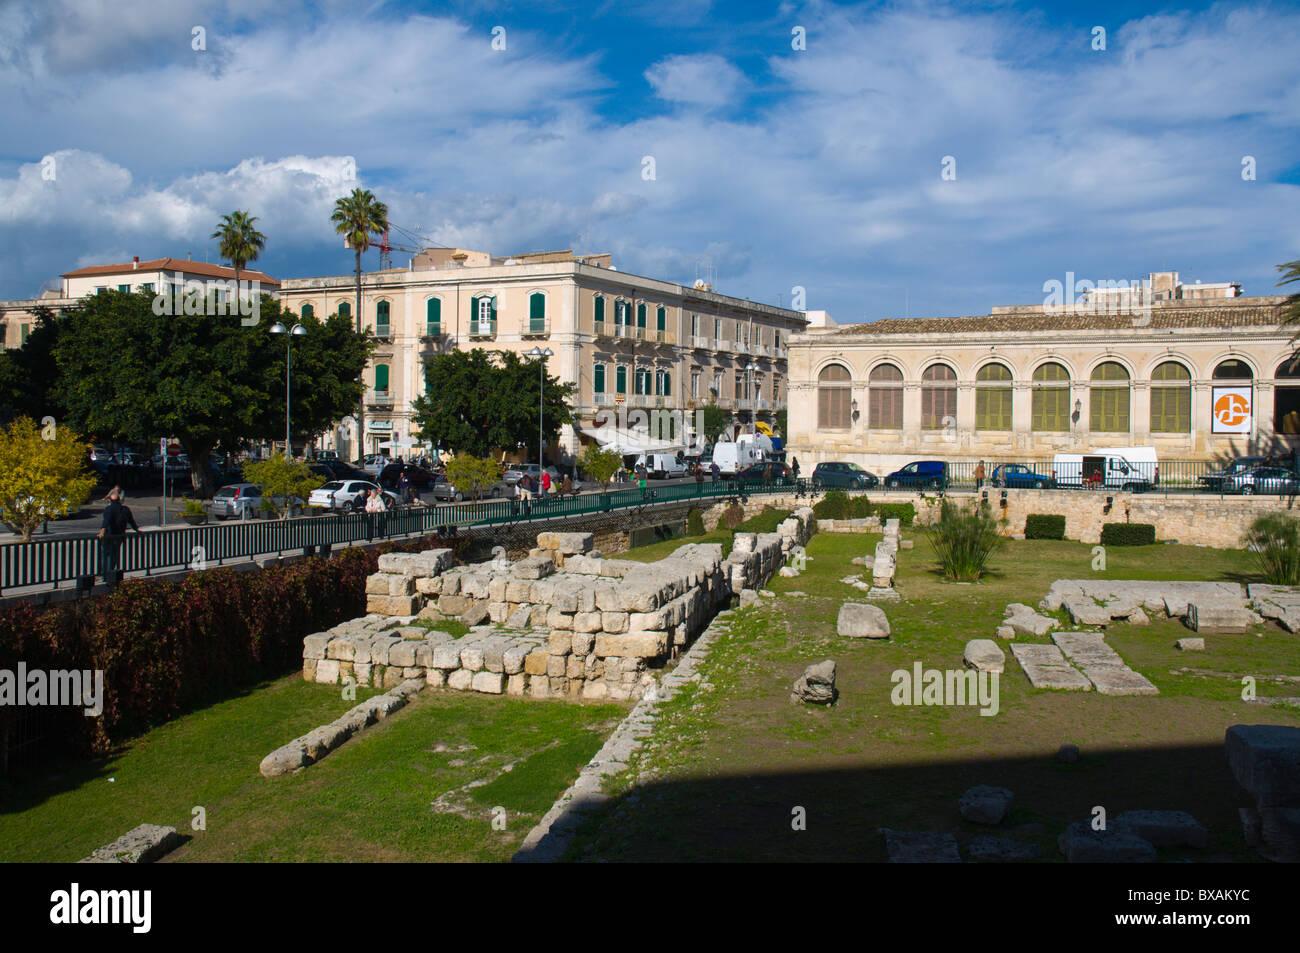 Tempie di Apollo Ortigia island Syracuse Sicily Italy Europe - Stock Image